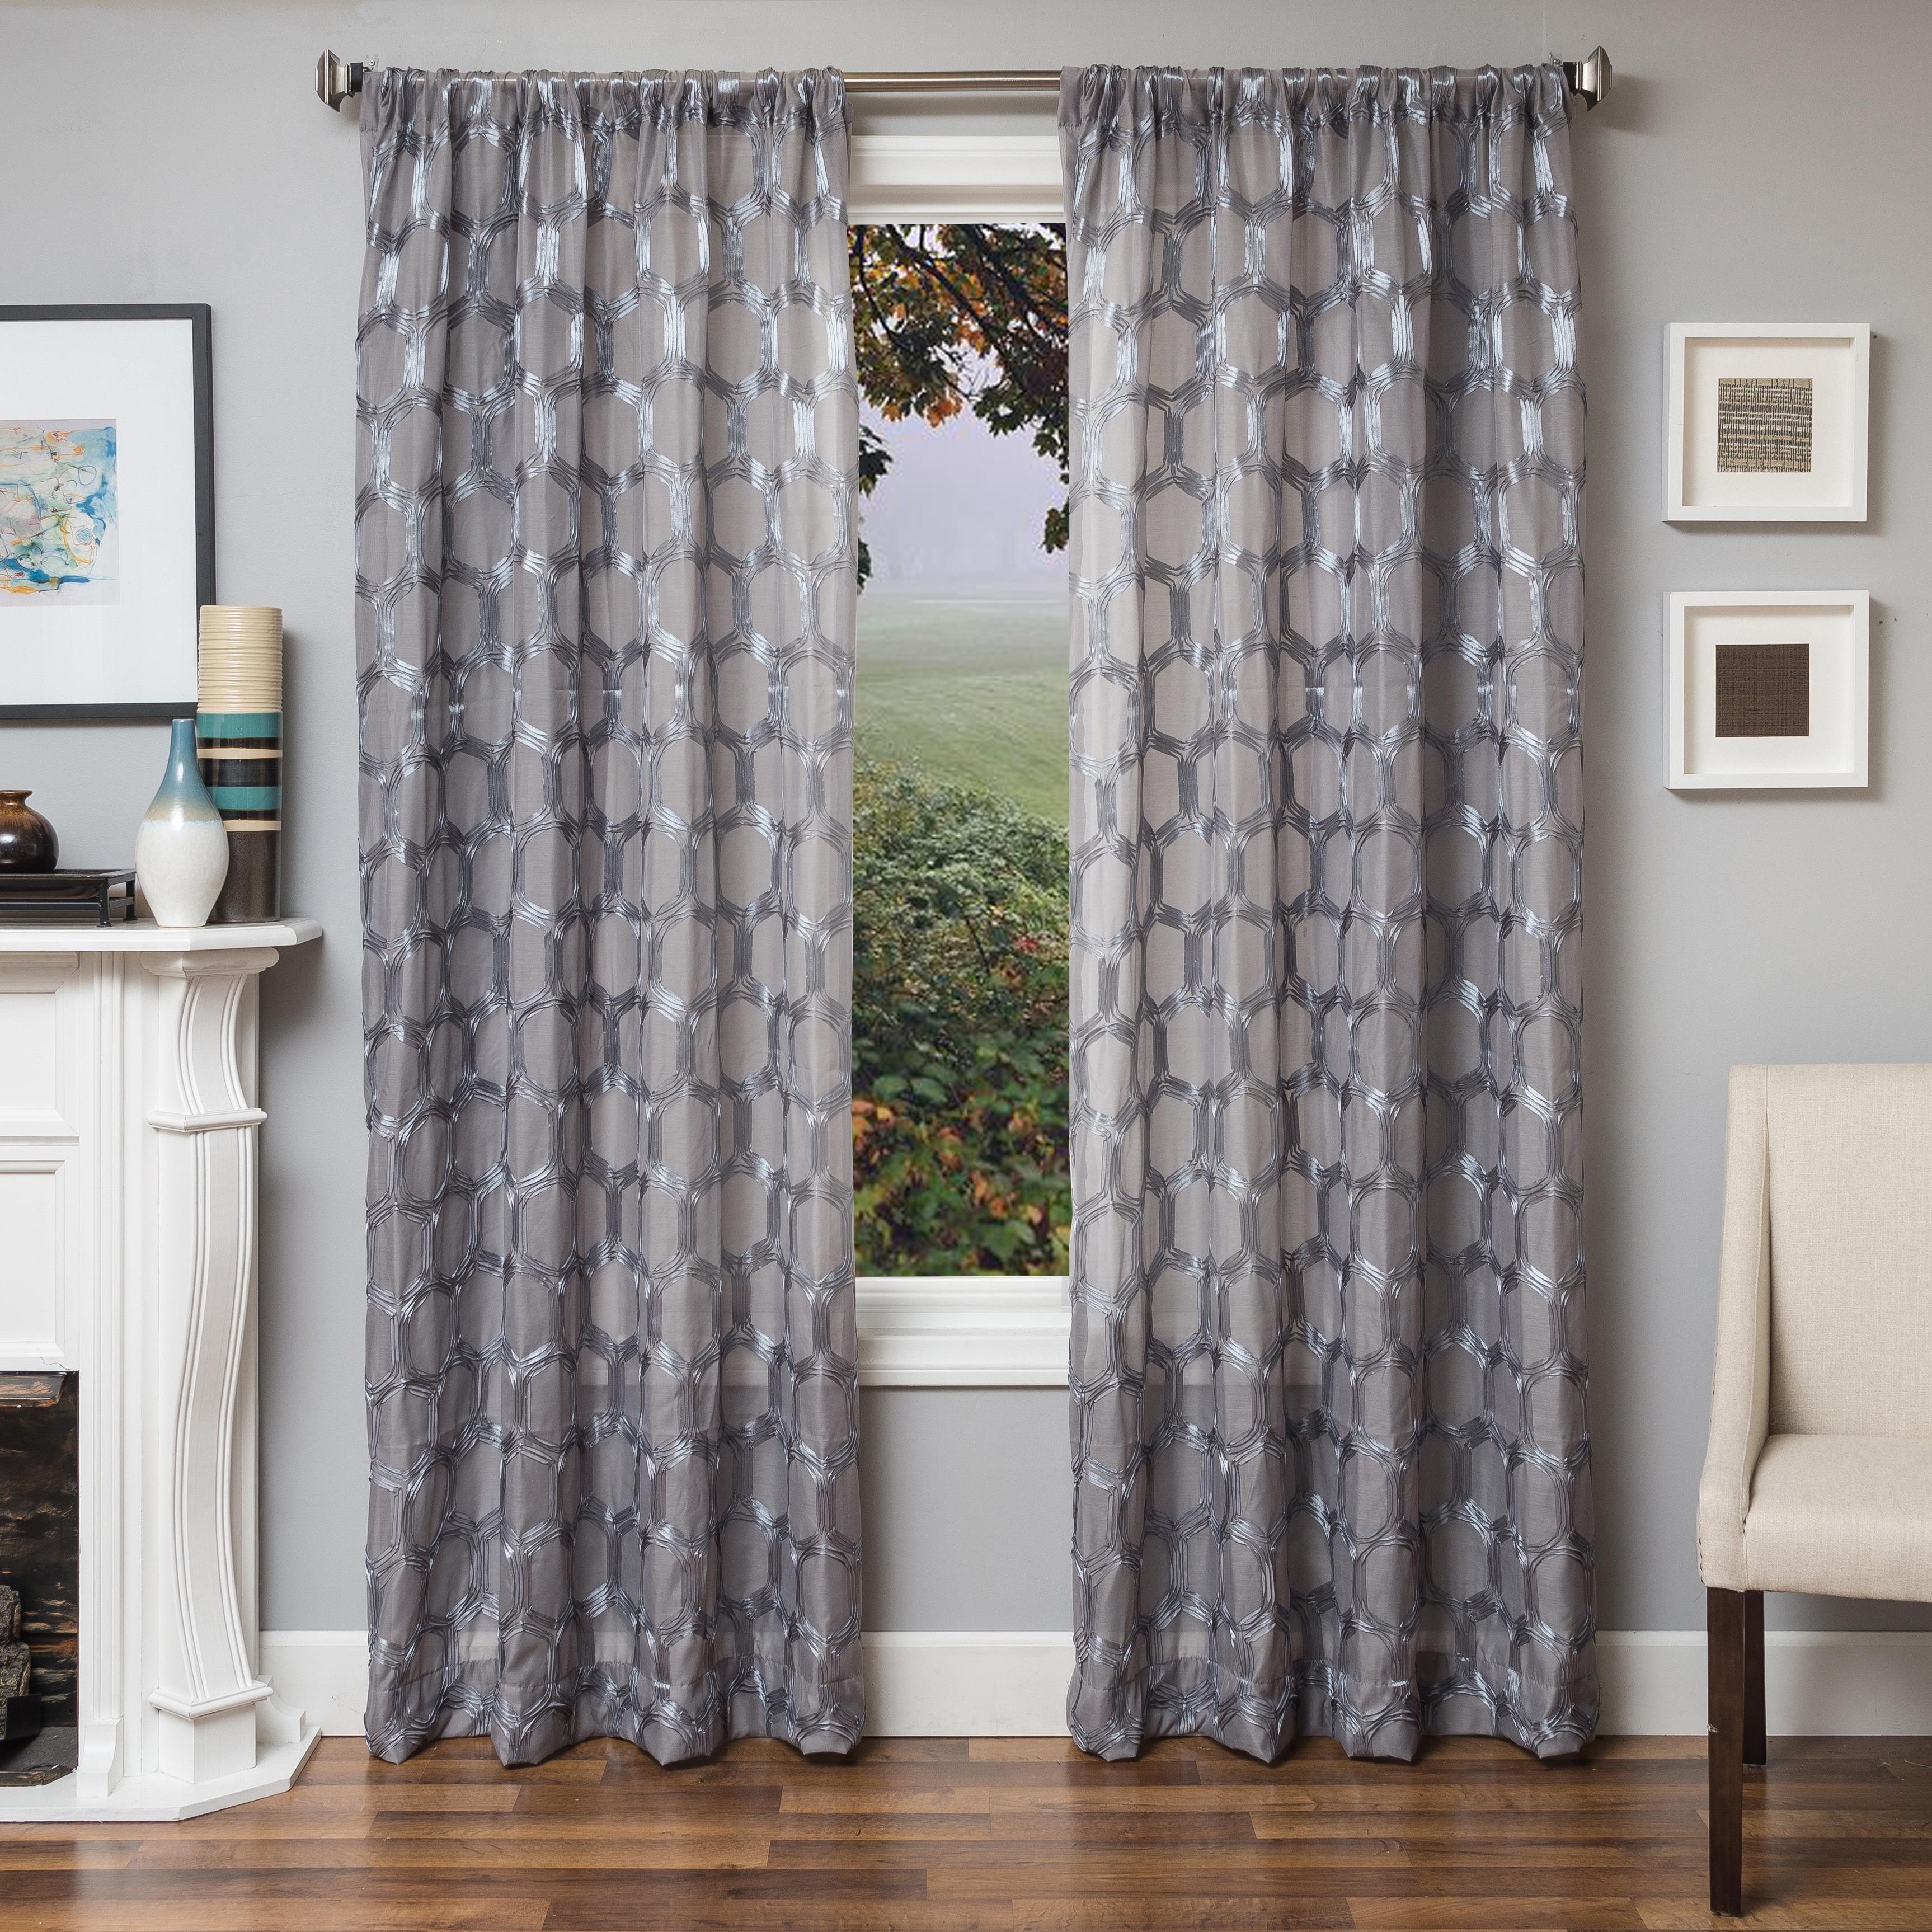 Rochelle 96 Sheer Panel Curtain Ashley Furniture Homestore Sheer Curtain Panels Panel Curtains White Sheer Curtains